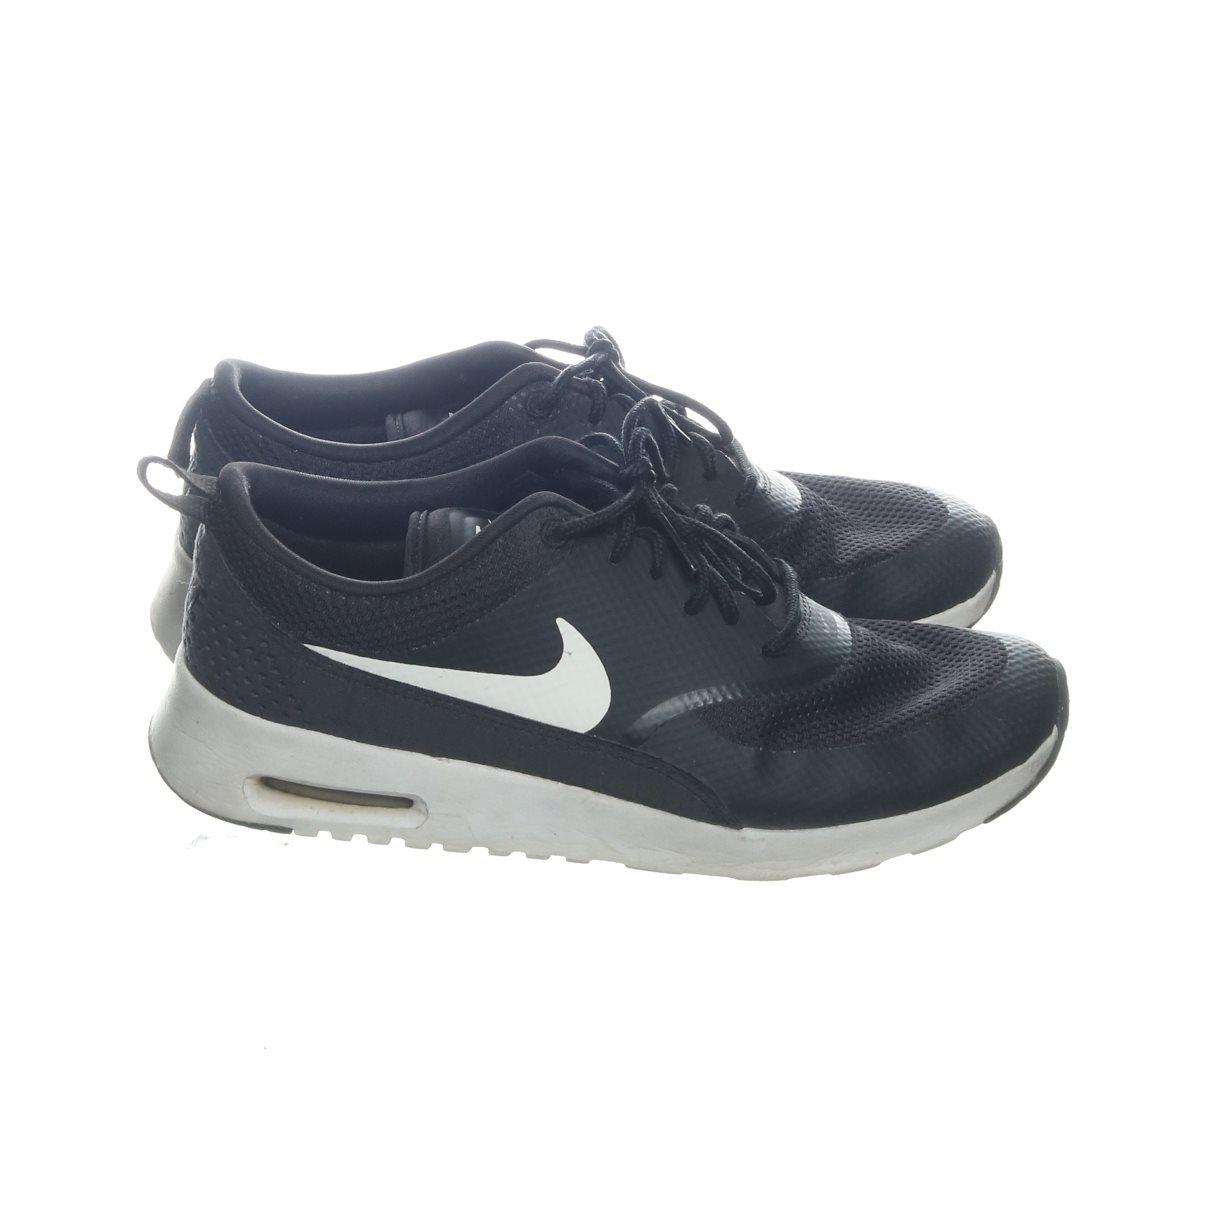 online store 8a5a4 a6f9d Nike, Sneakers, Strl  38.5, Air Max Thea, Svart Vit